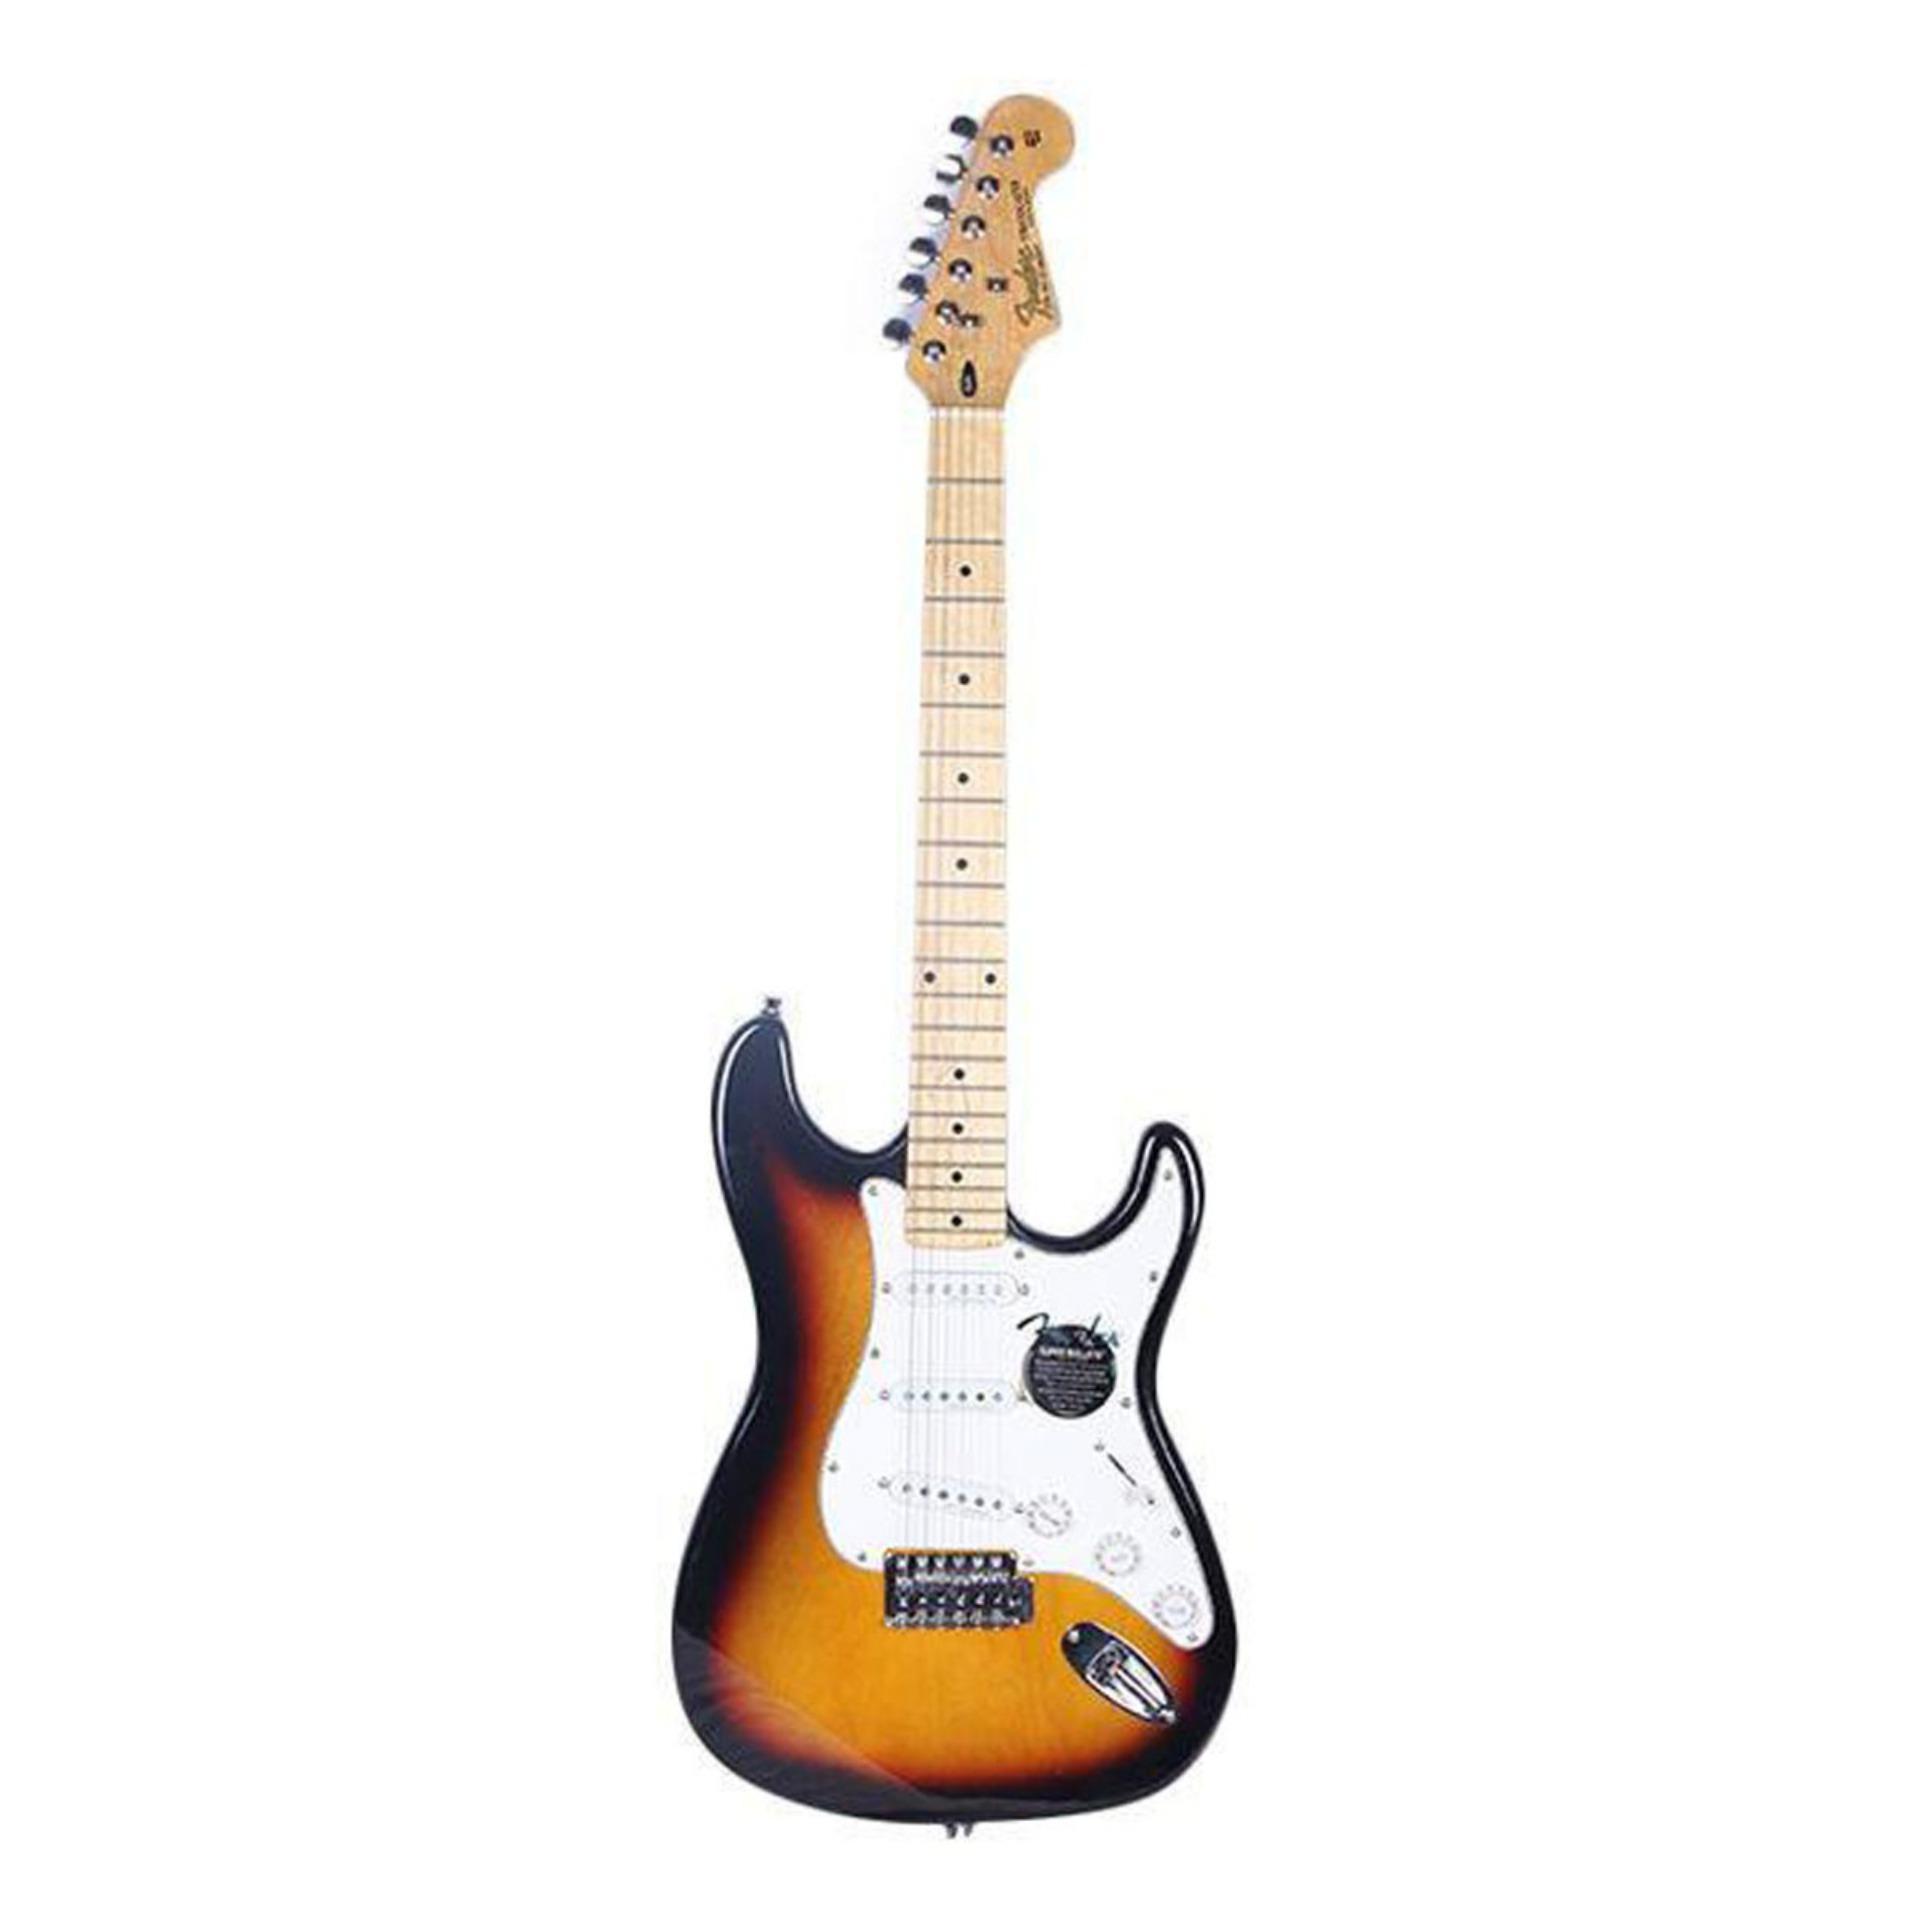 Fender Stratocaster Price >> Fender Stratocaster Electric Guitar Sunburst